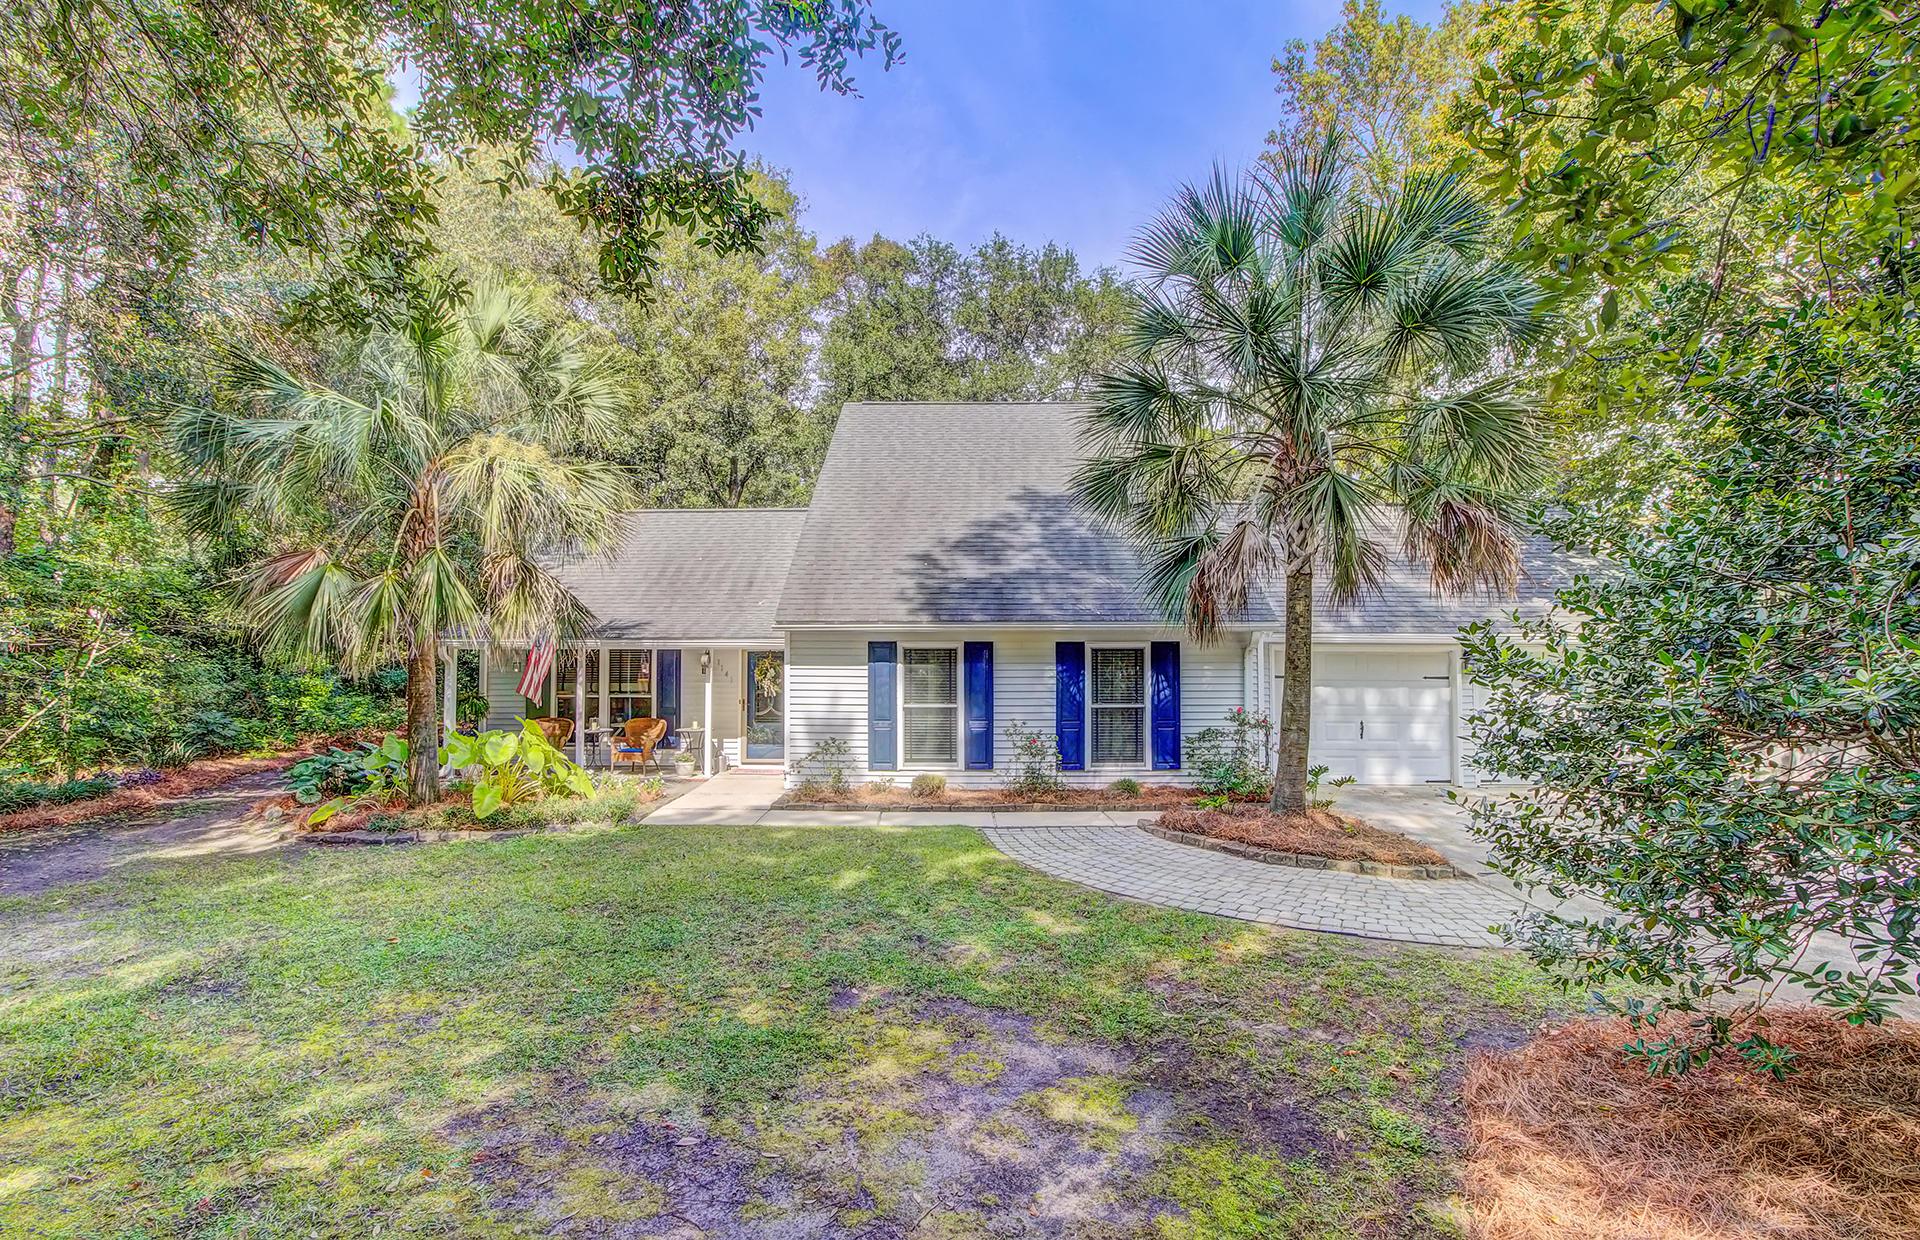 Snee Farm Homes For Sale - 1141 Shady Grove, Mount Pleasant, SC - 30